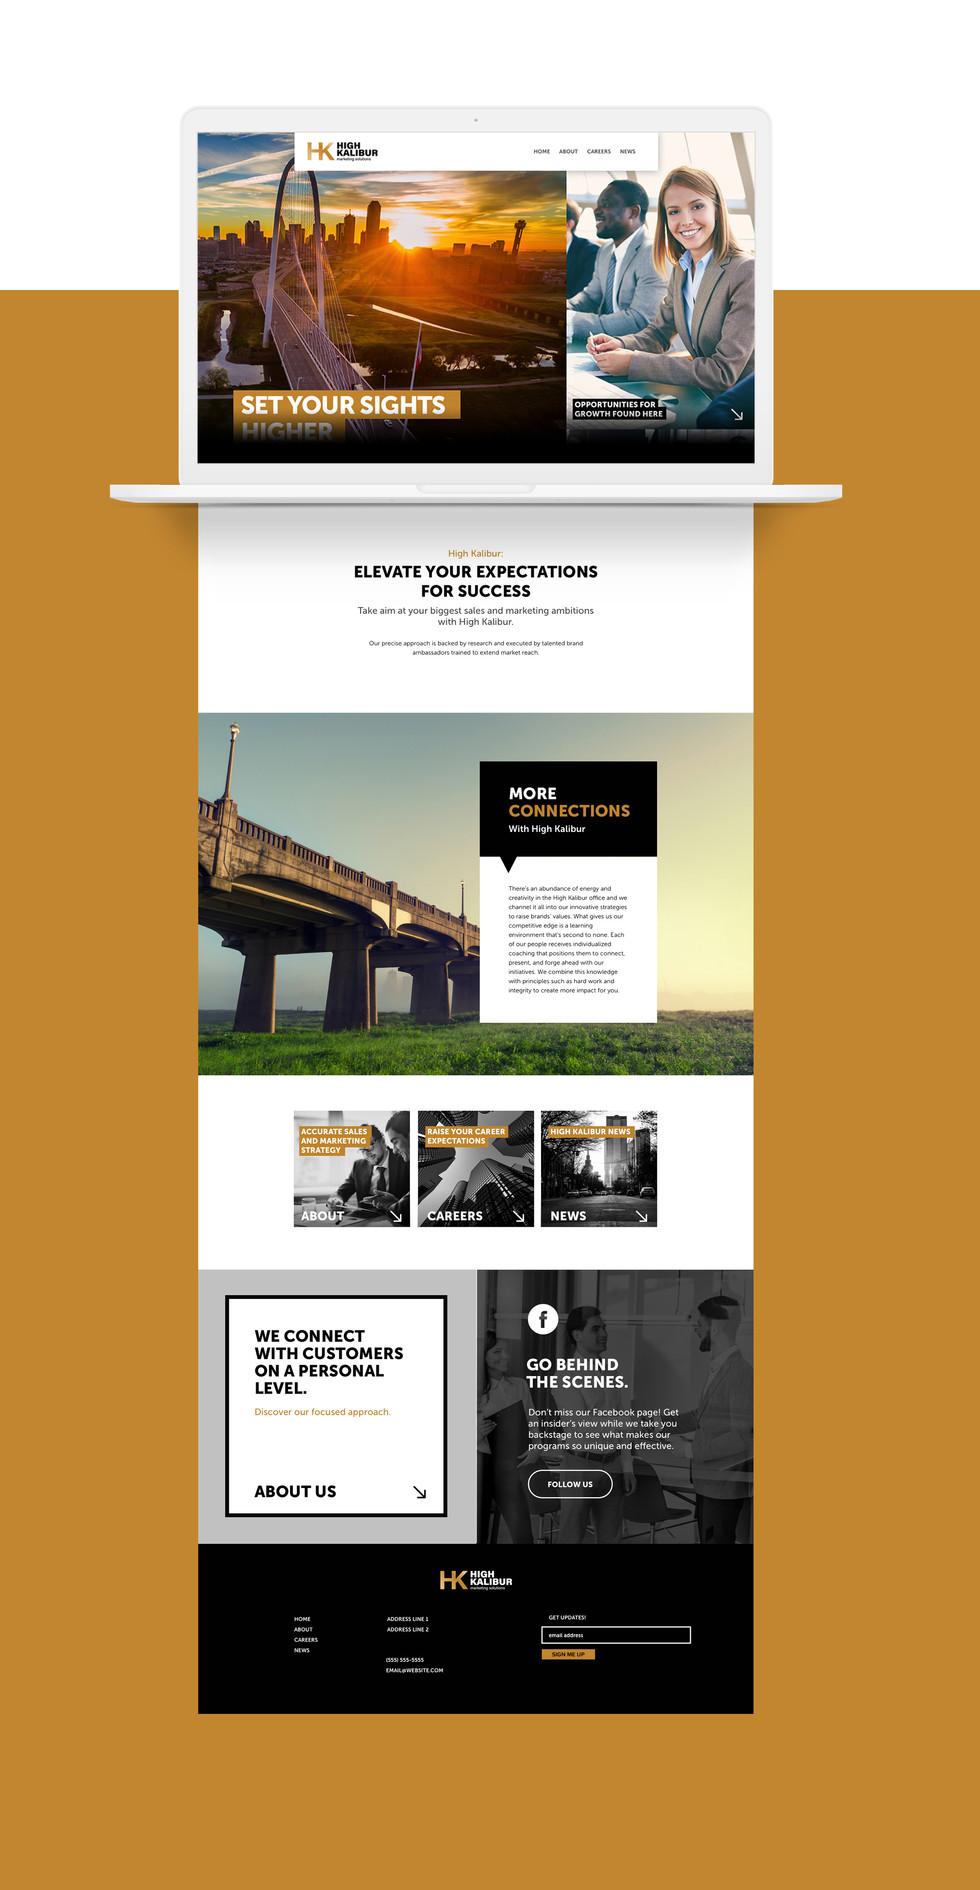 AreiaDesign-Portfolio-HighKalibur-6.jpg